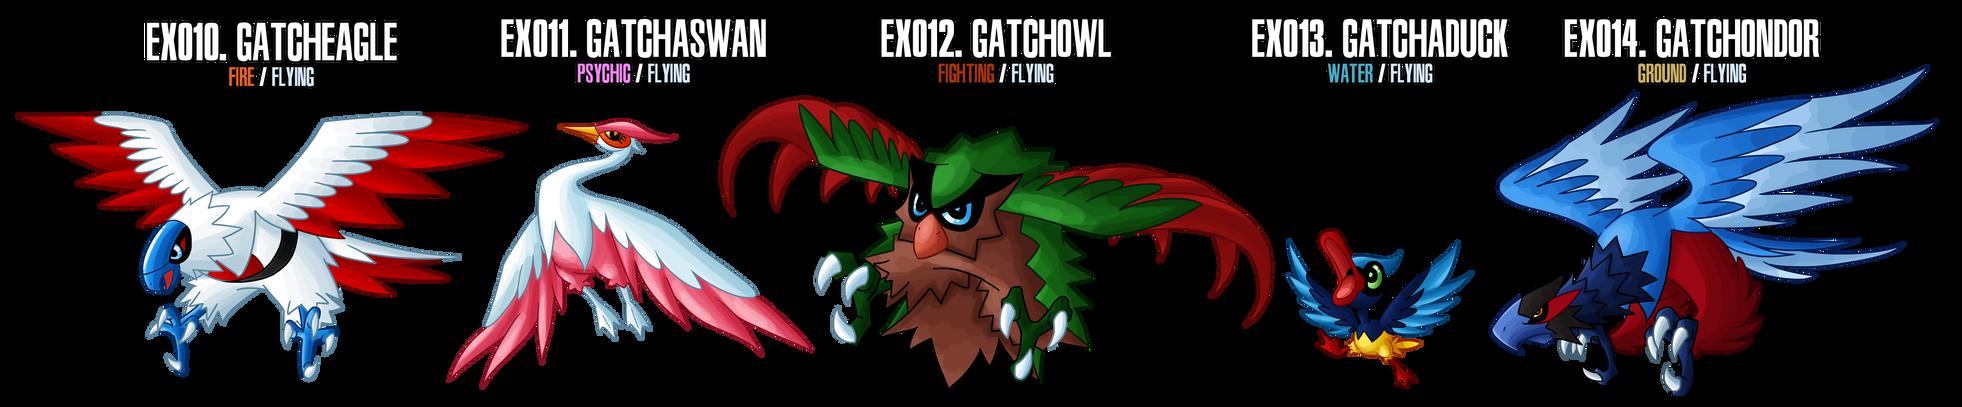 Fakemon: EX010 - EX014 by MTC-Studios